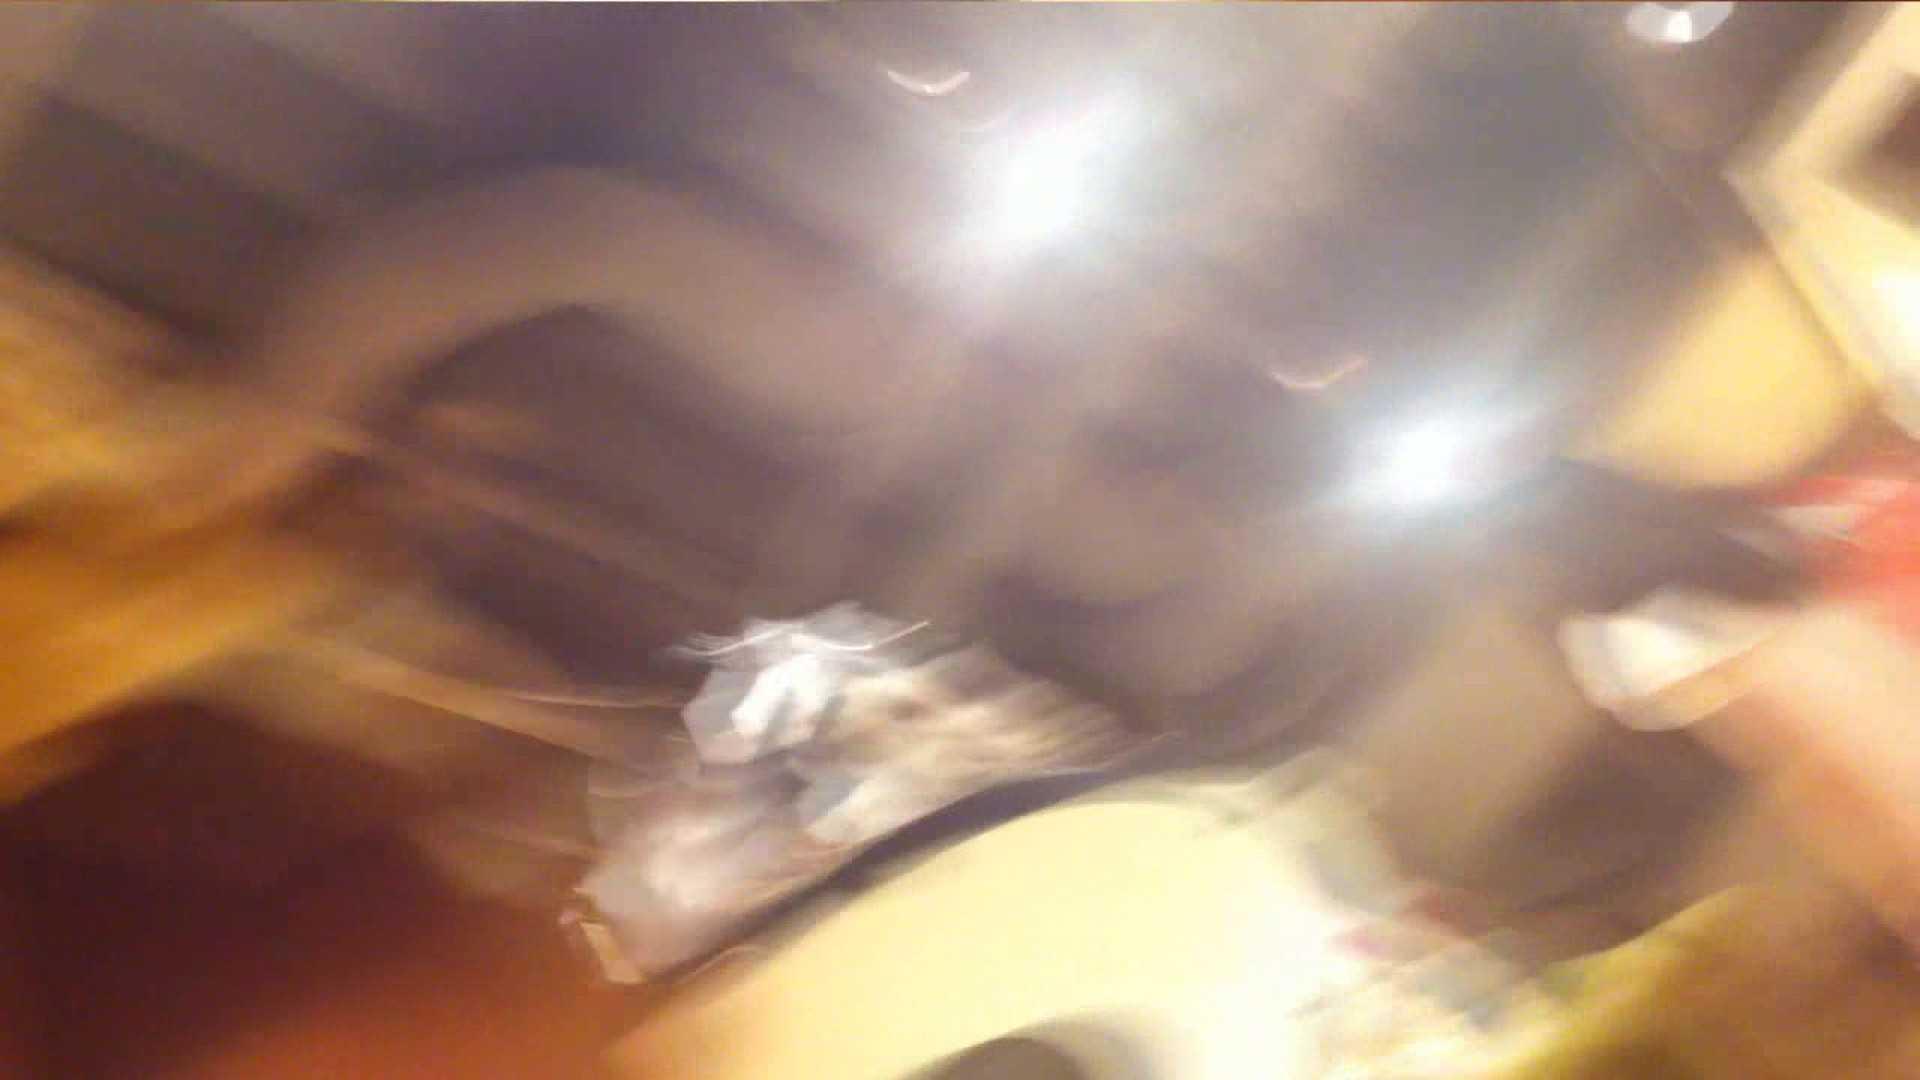 vol.34 美人アパレル胸チラ&パンチラ メガネ属性っていいよね♥ 胸チラ 盗み撮りSEX無修正画像 66PICs 54